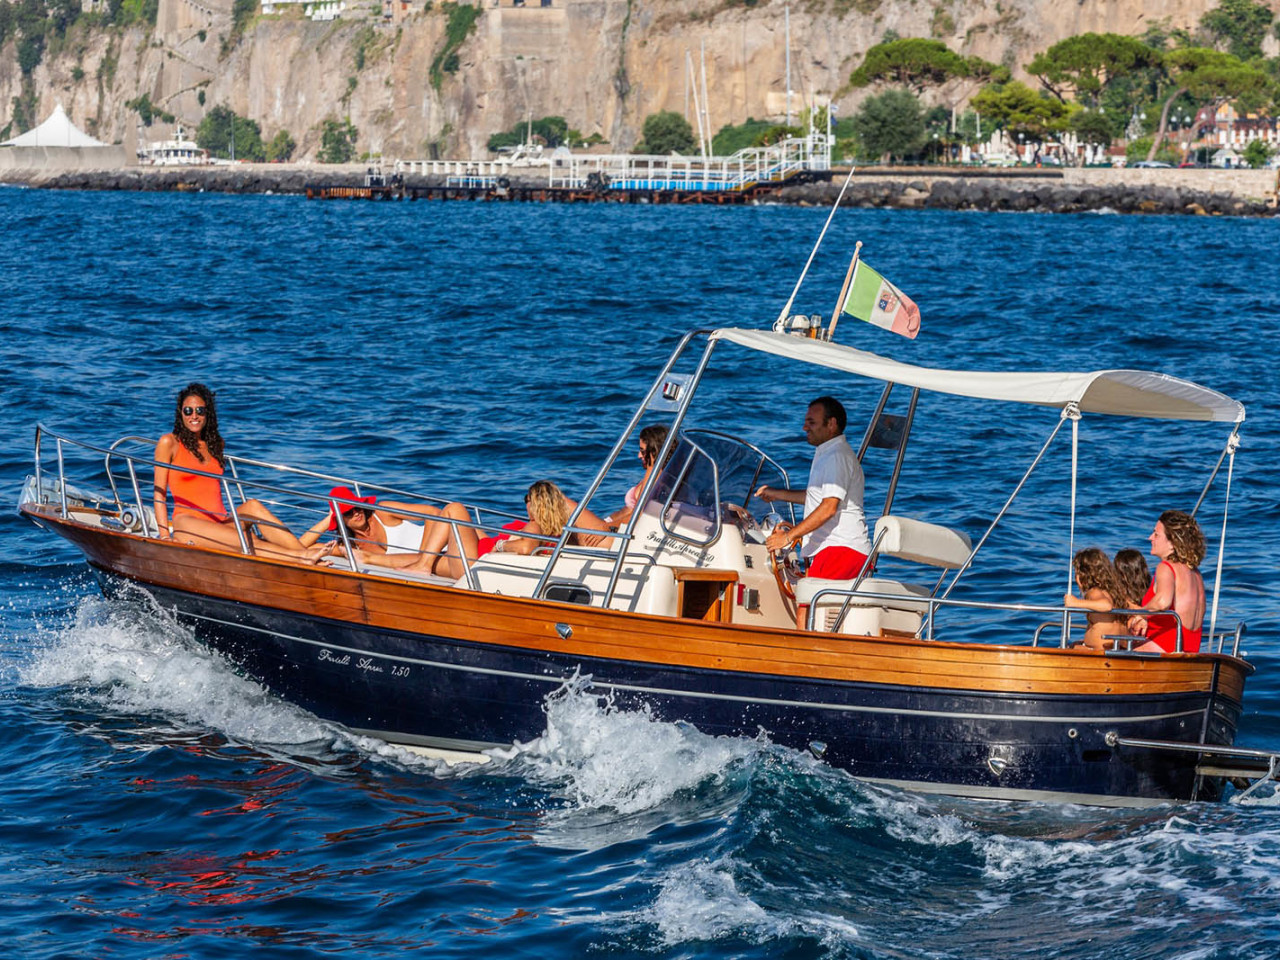 FRATELLI APREA 750 | Mar Amar boat tour Sorrento